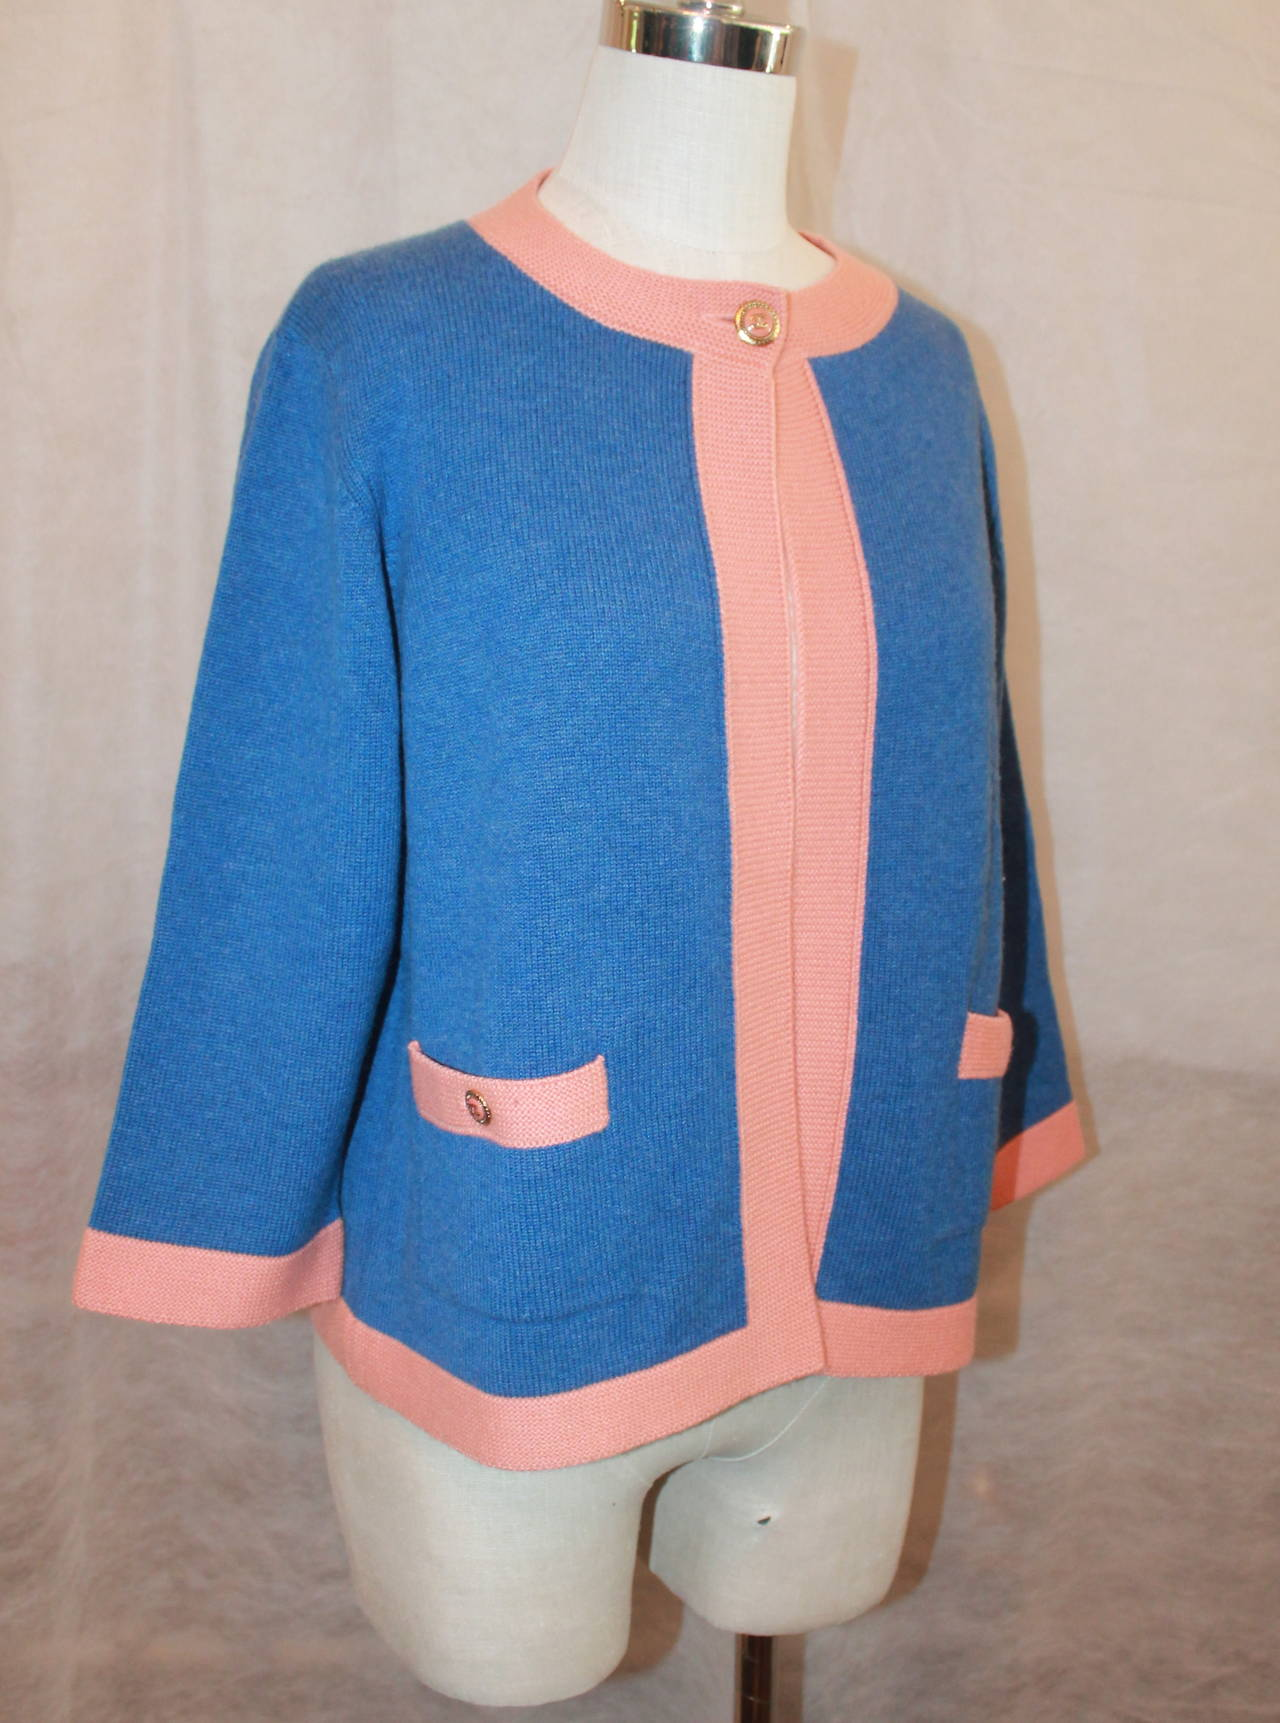 Chanel 2007 Blue & Peach Cashmere Sweater - 46 2